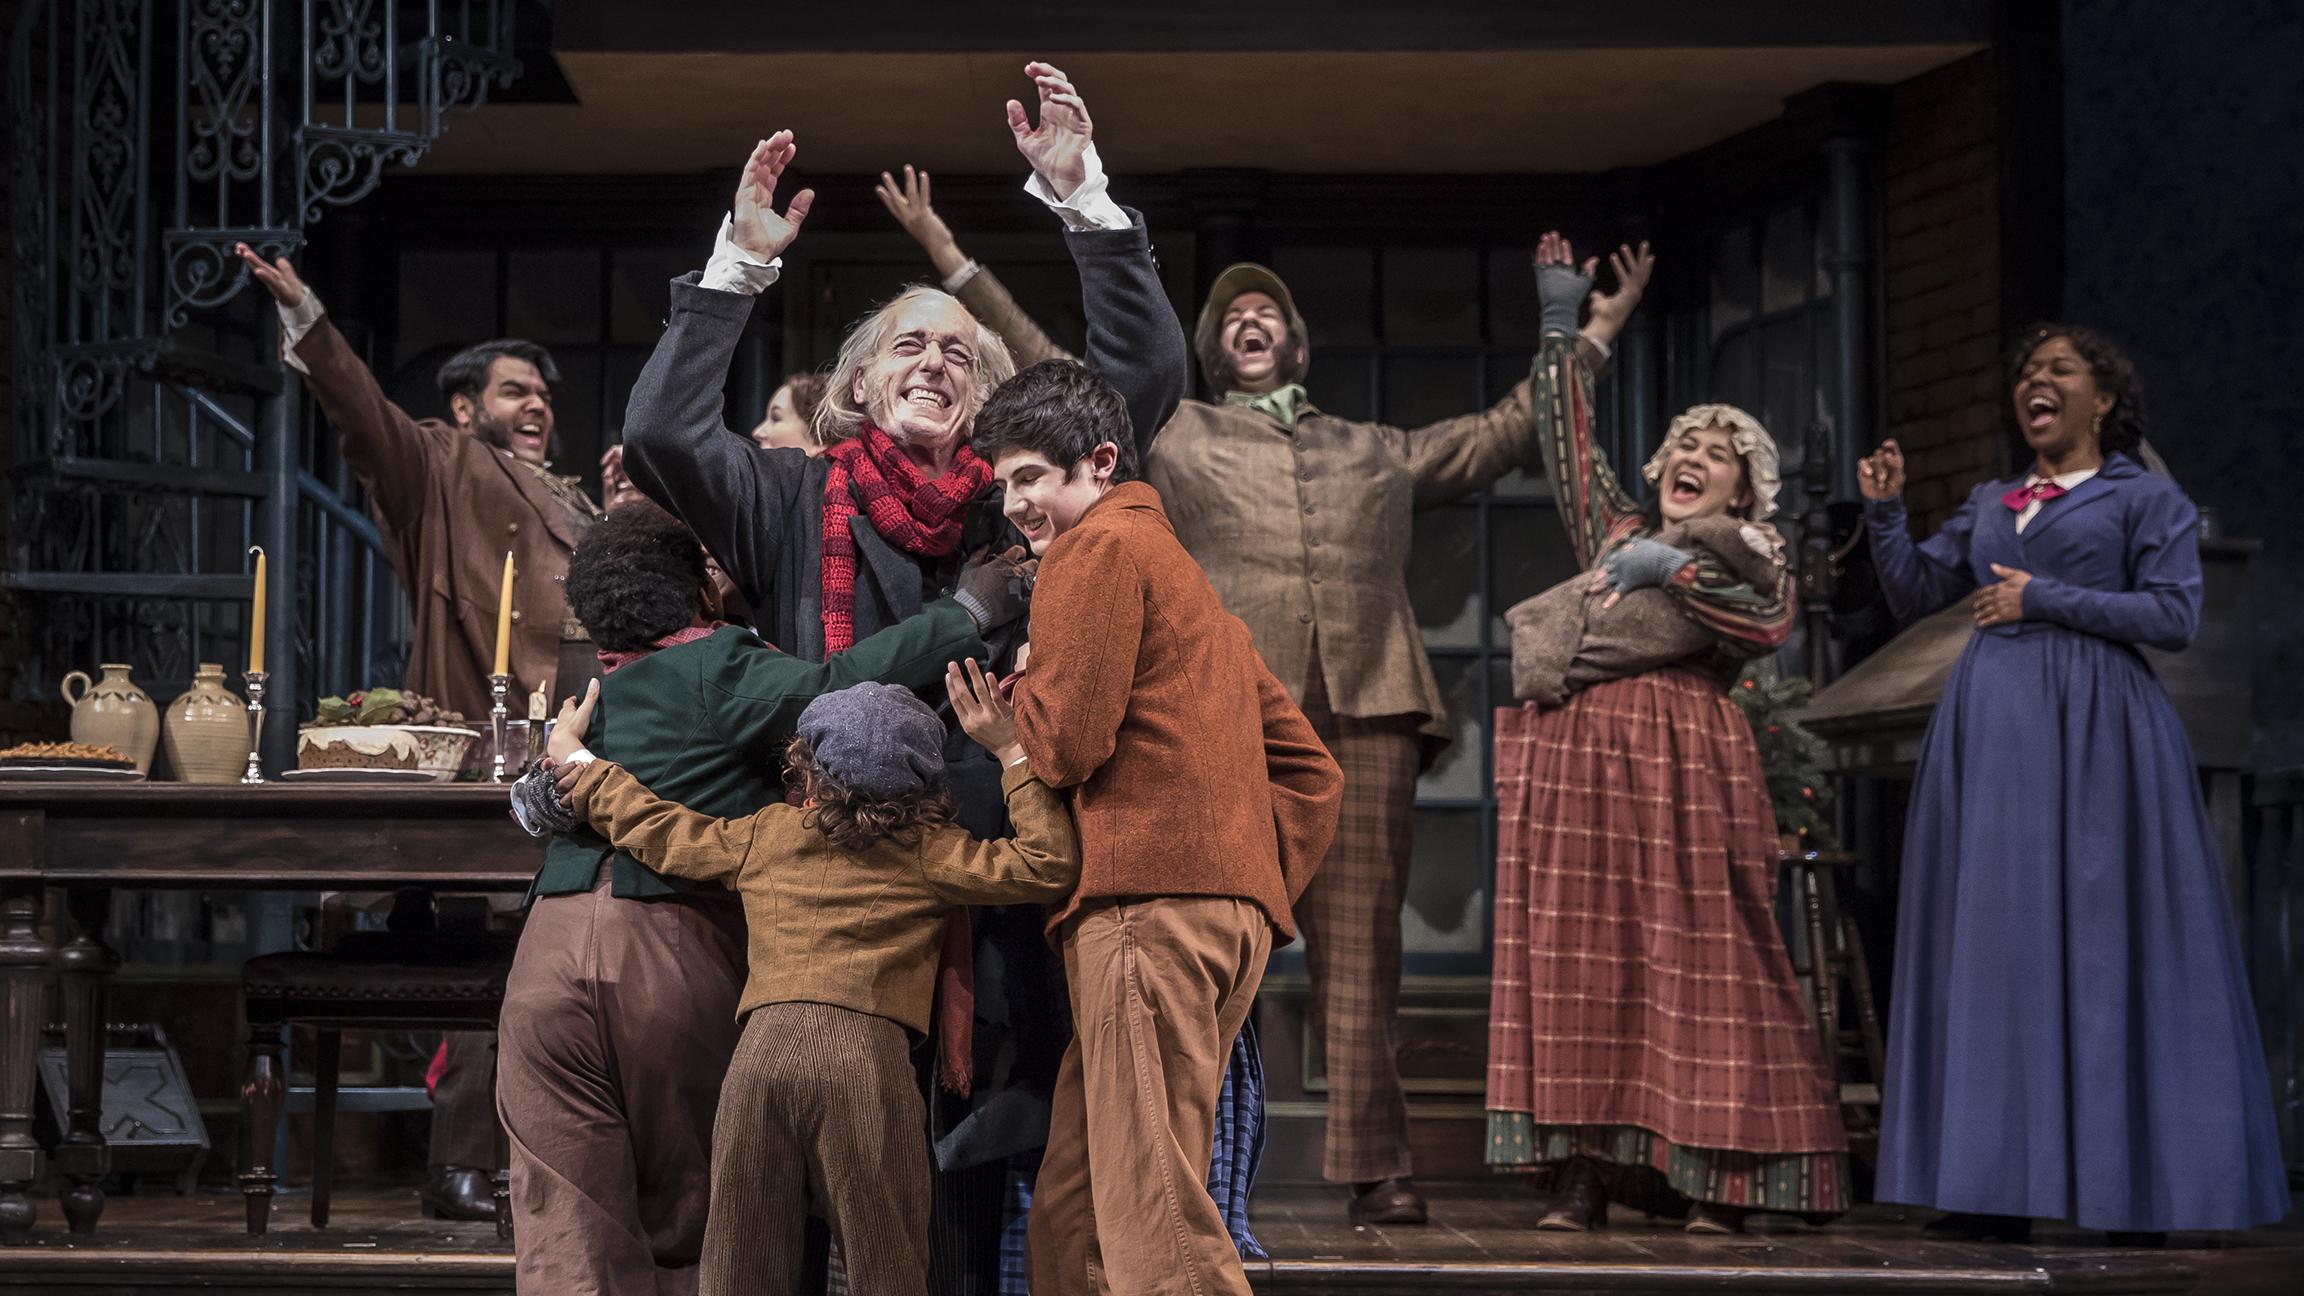 A Christmas Carol Cast.A Christmas Carol At Goodman Theatre Celebrates 40th